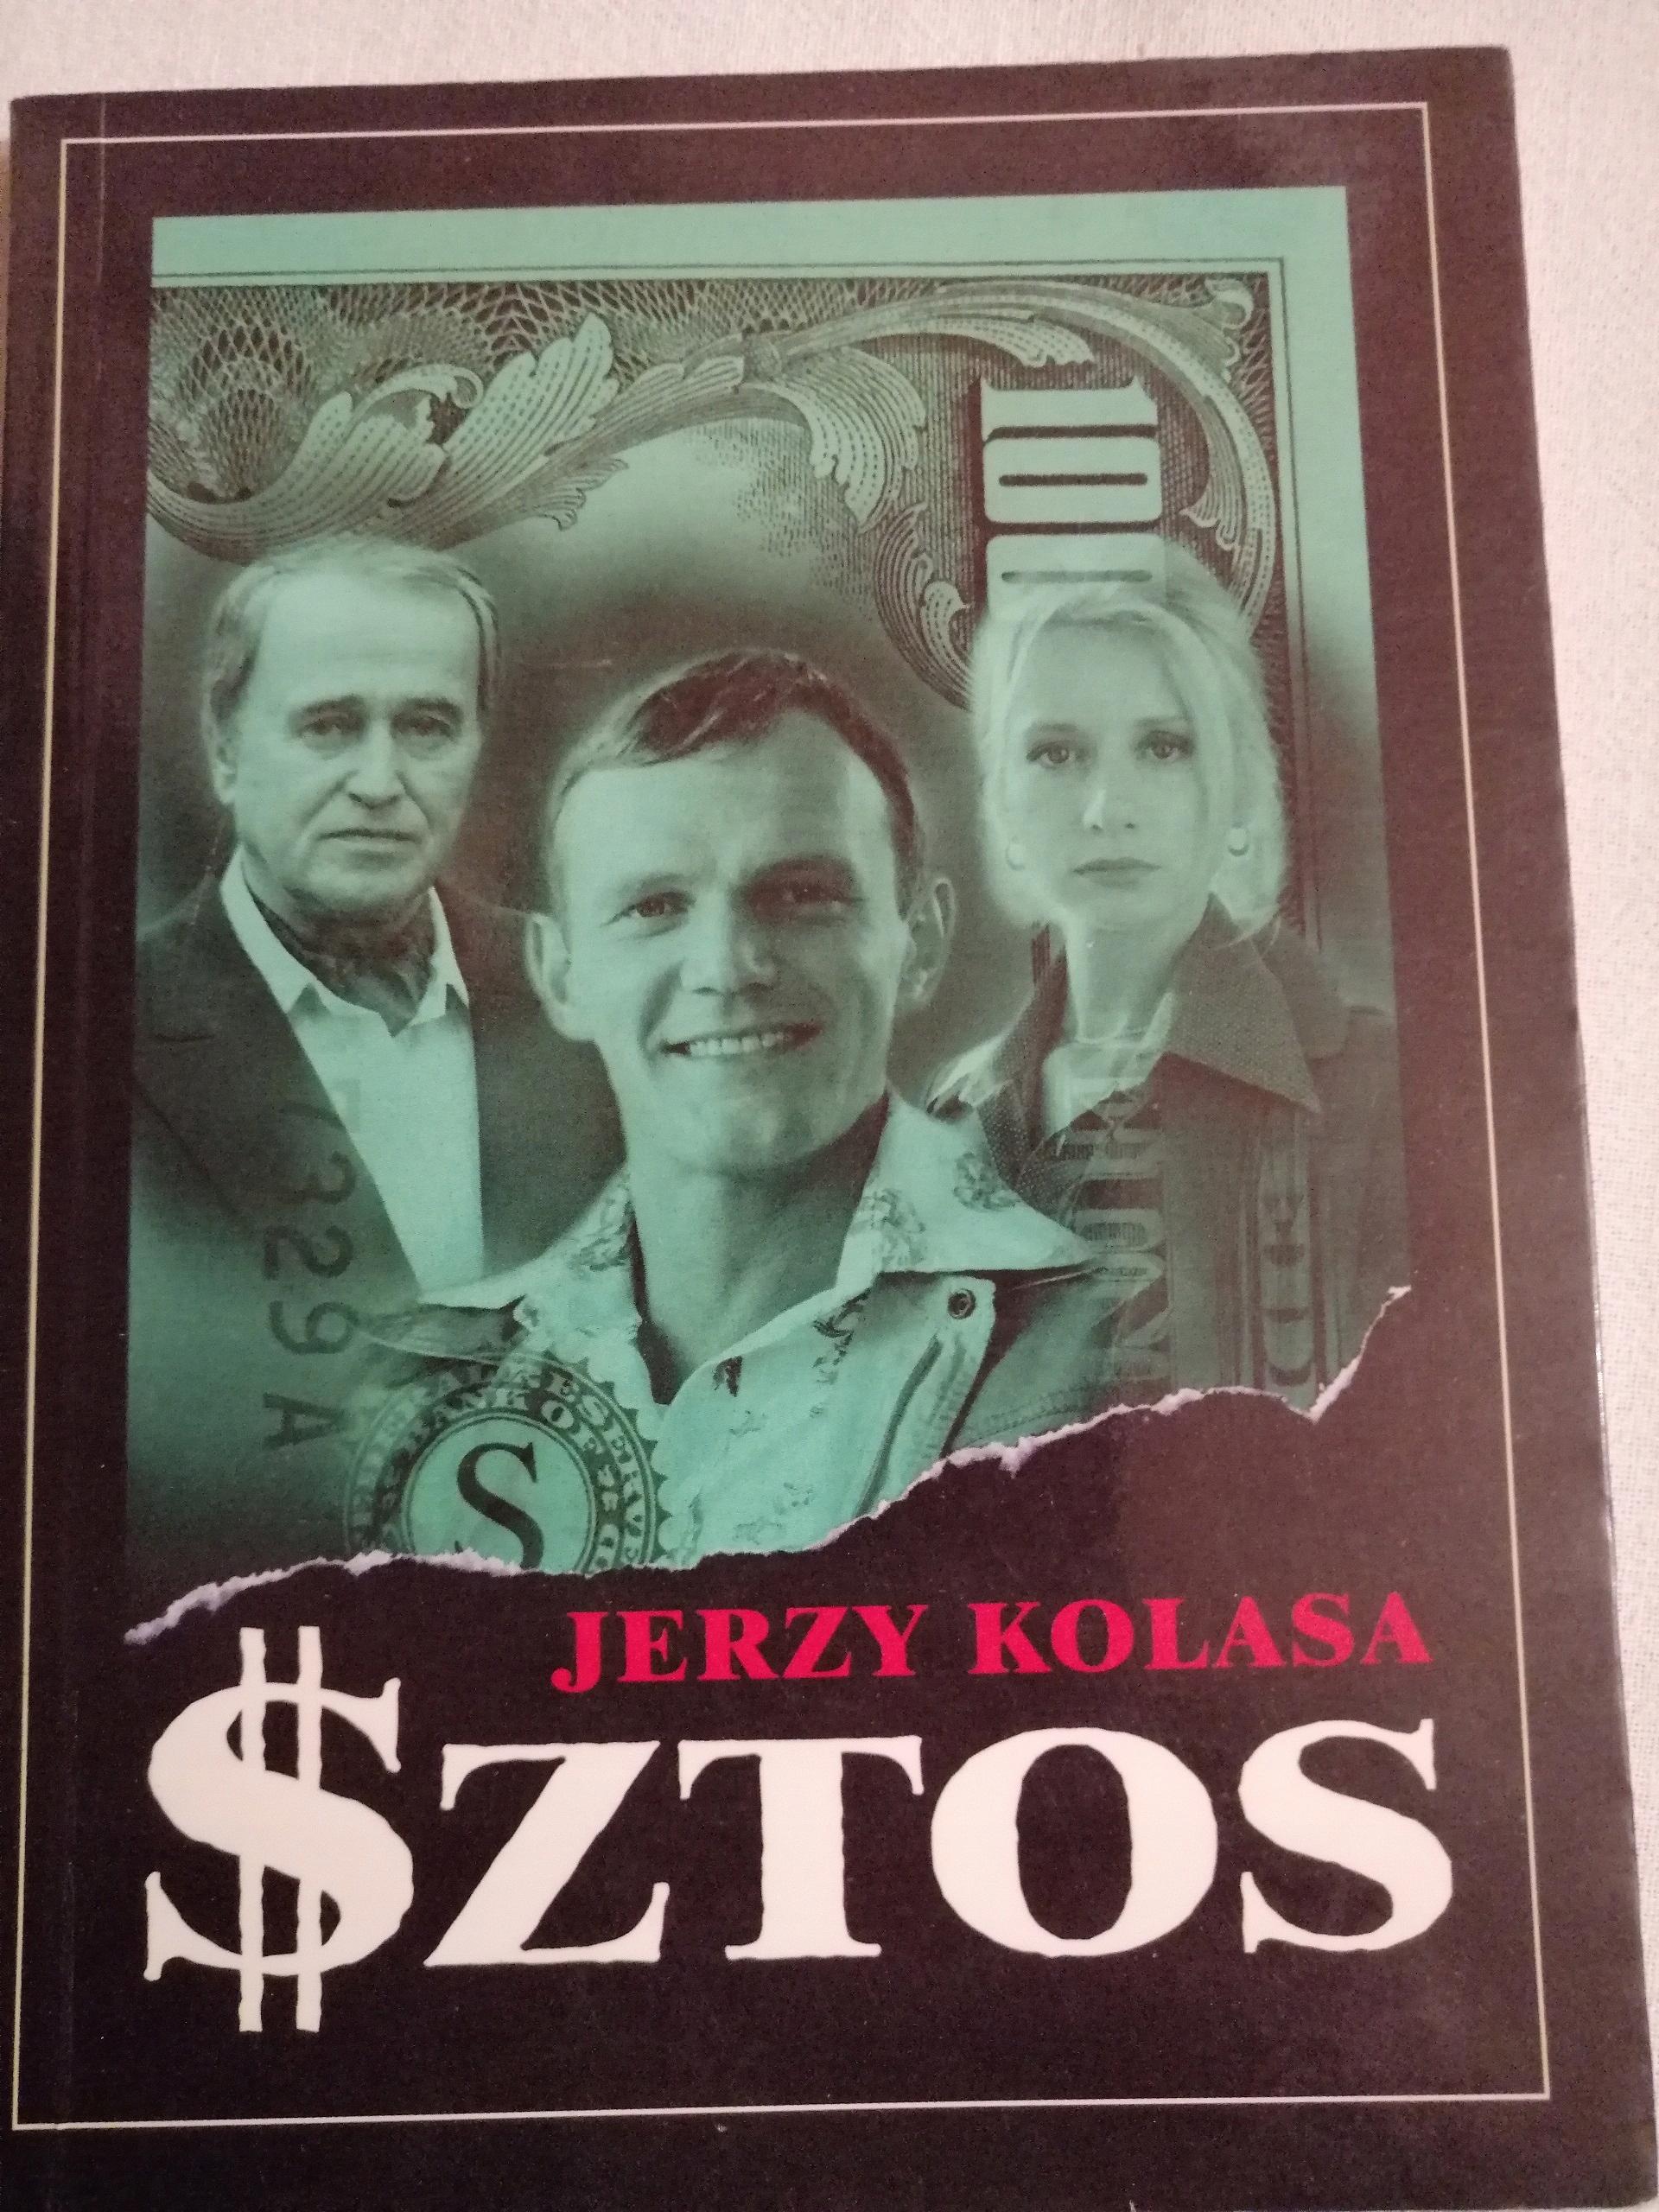 Sztos Jerzy Kolasa